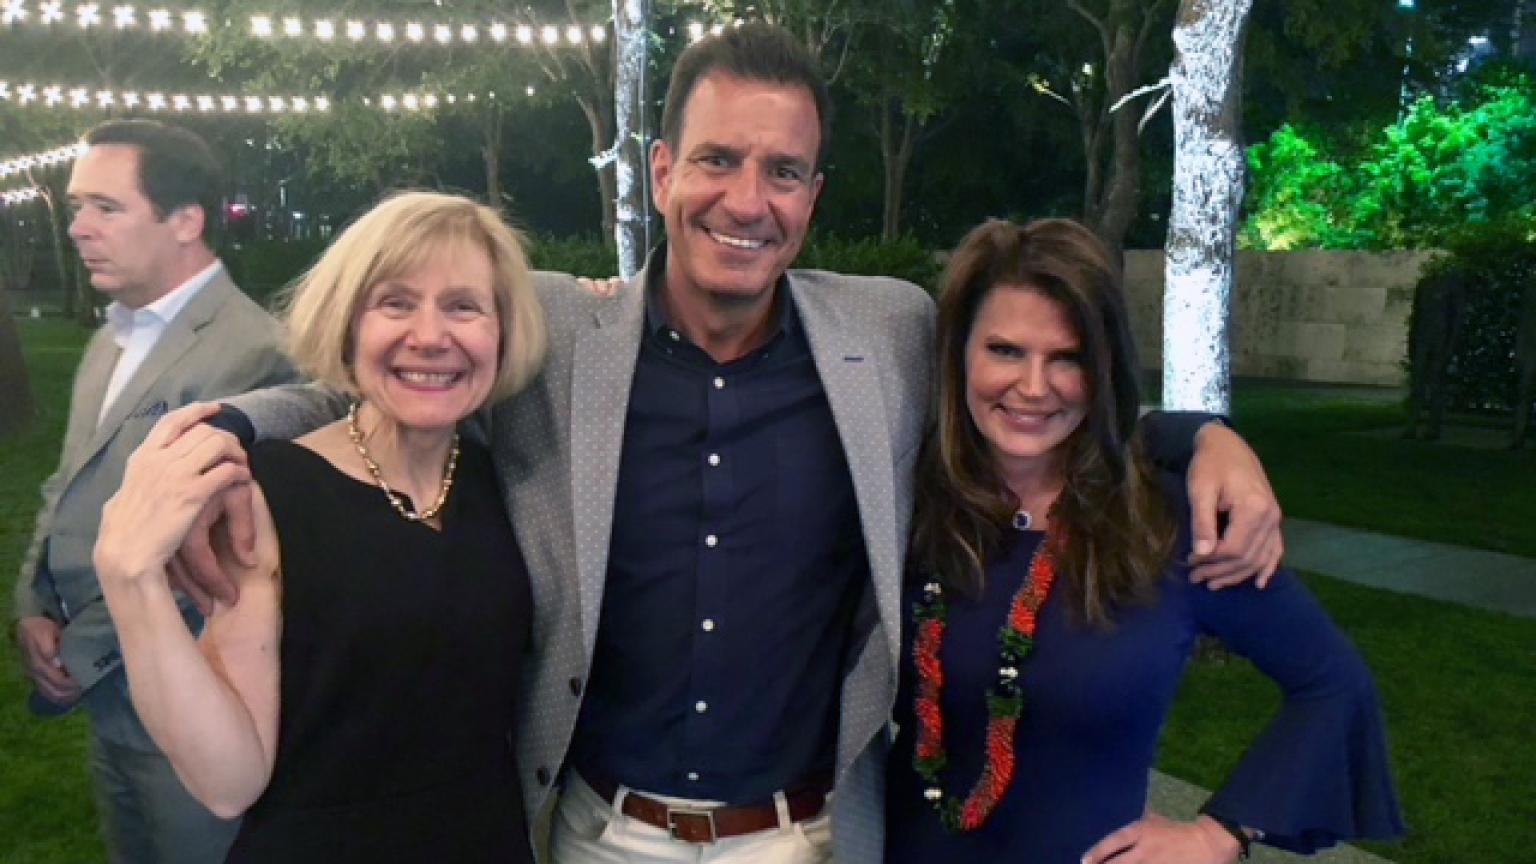 Dr. Eva Feldman, Mike Stein and Tammy Wood